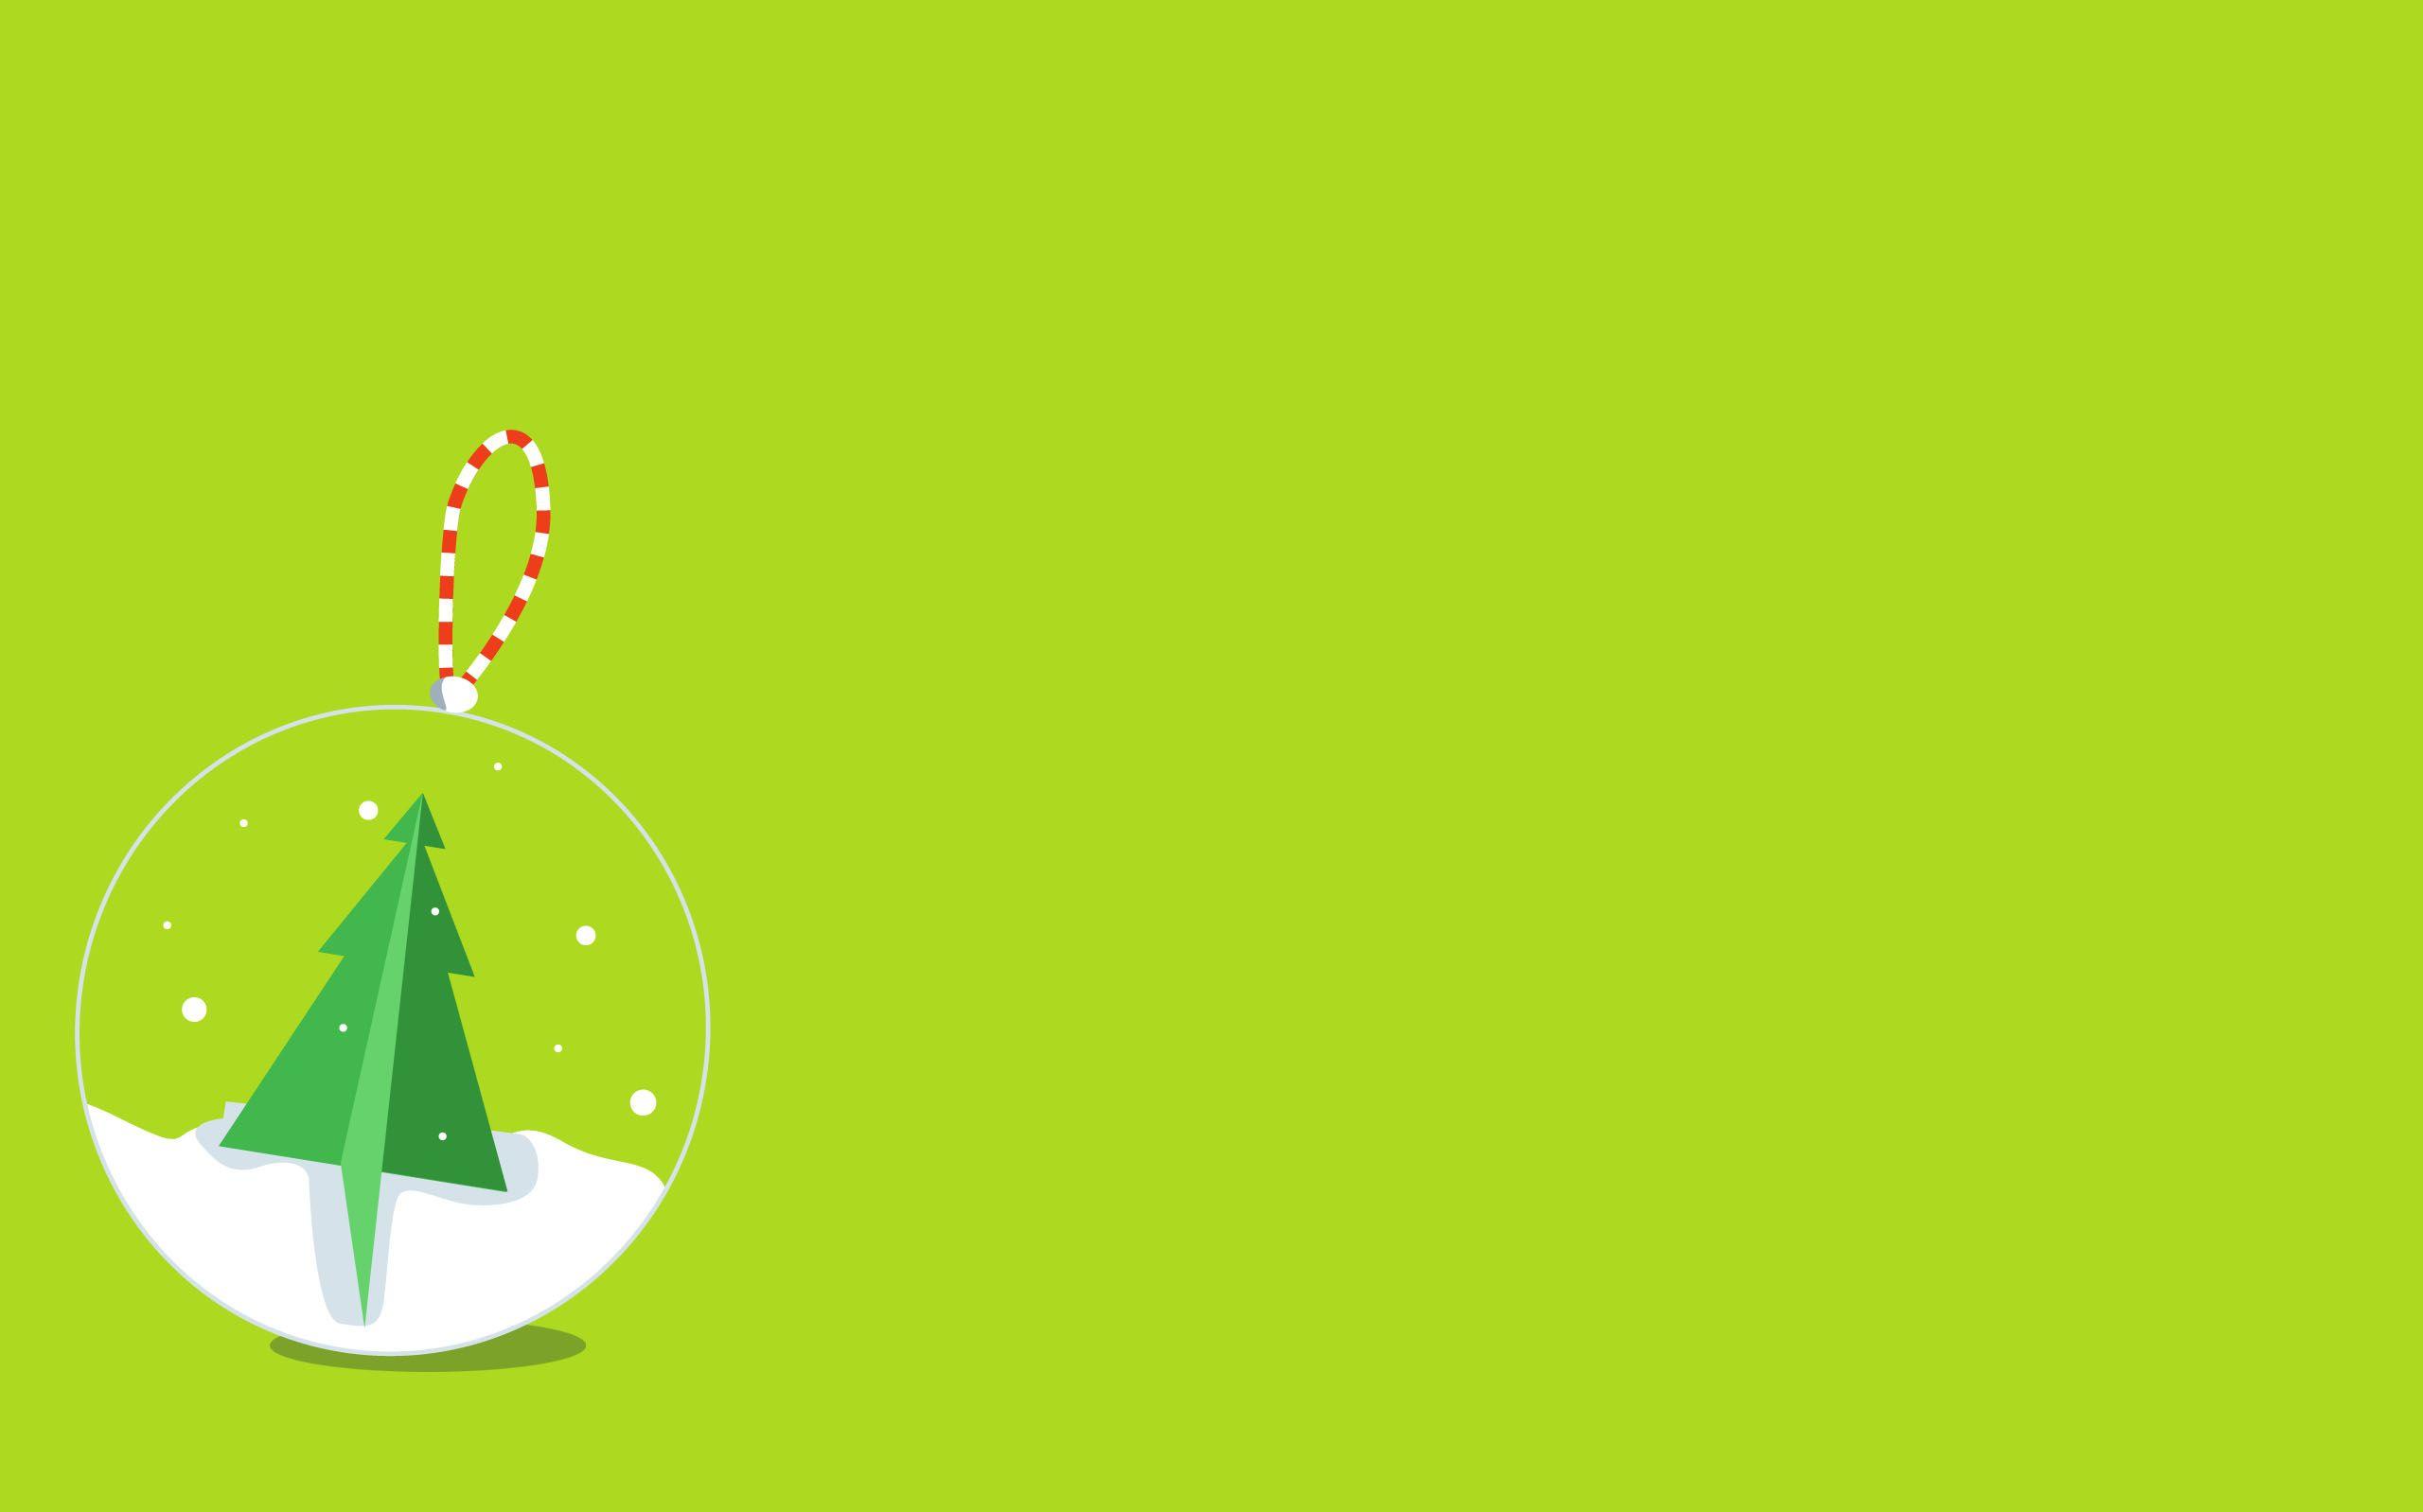 Download Holiday Hd Wallpapers Free Snowflake Wallpaper Christmas Wallpaper Ipad Background Hd Wallpaper